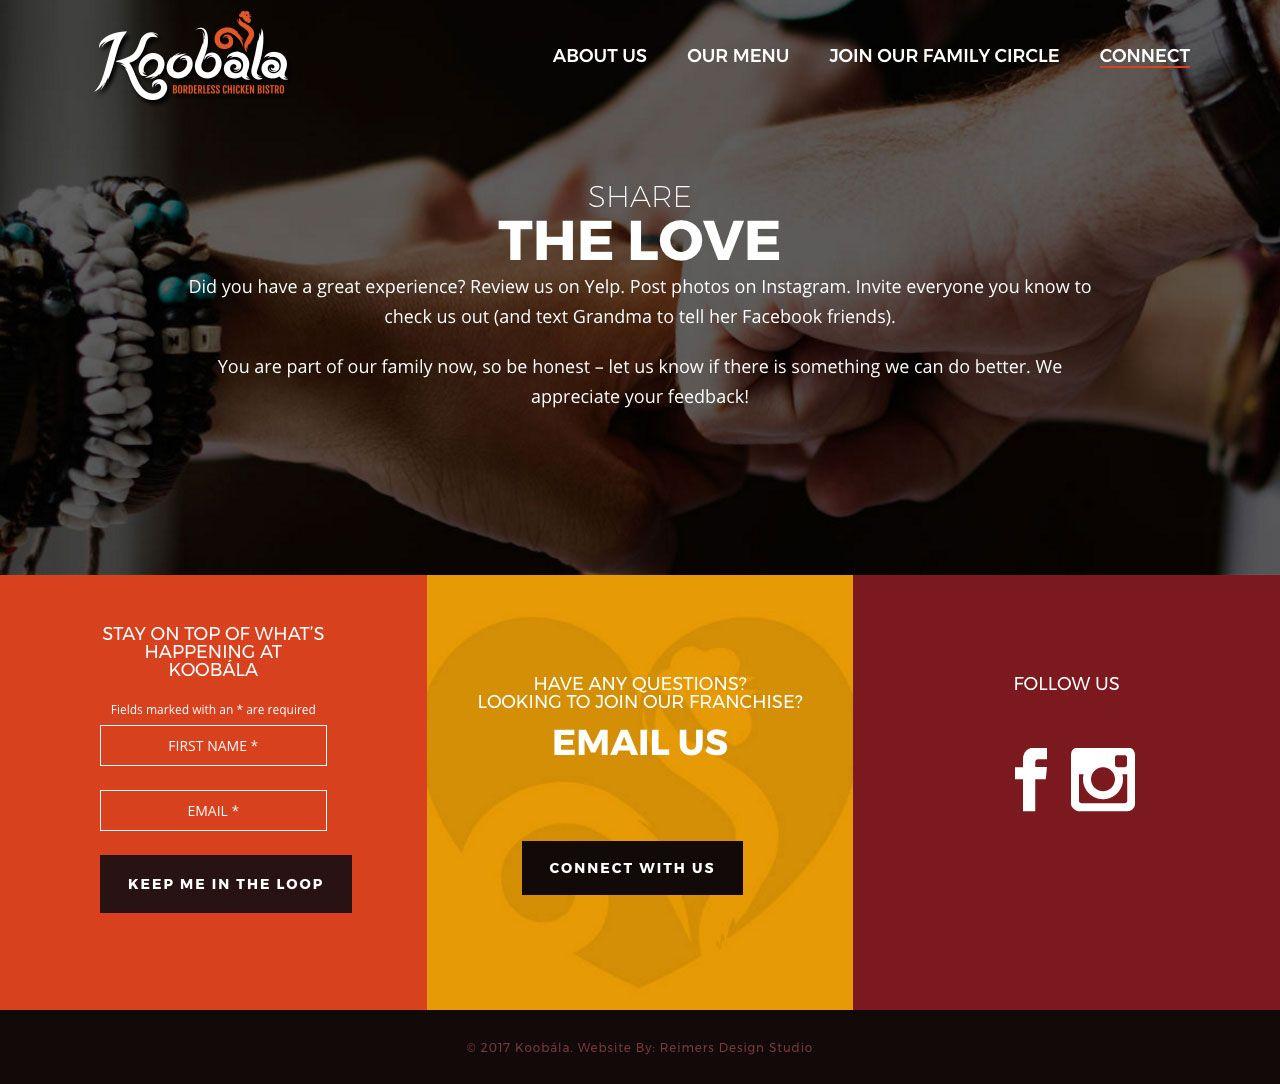 Koobala - Share the Love